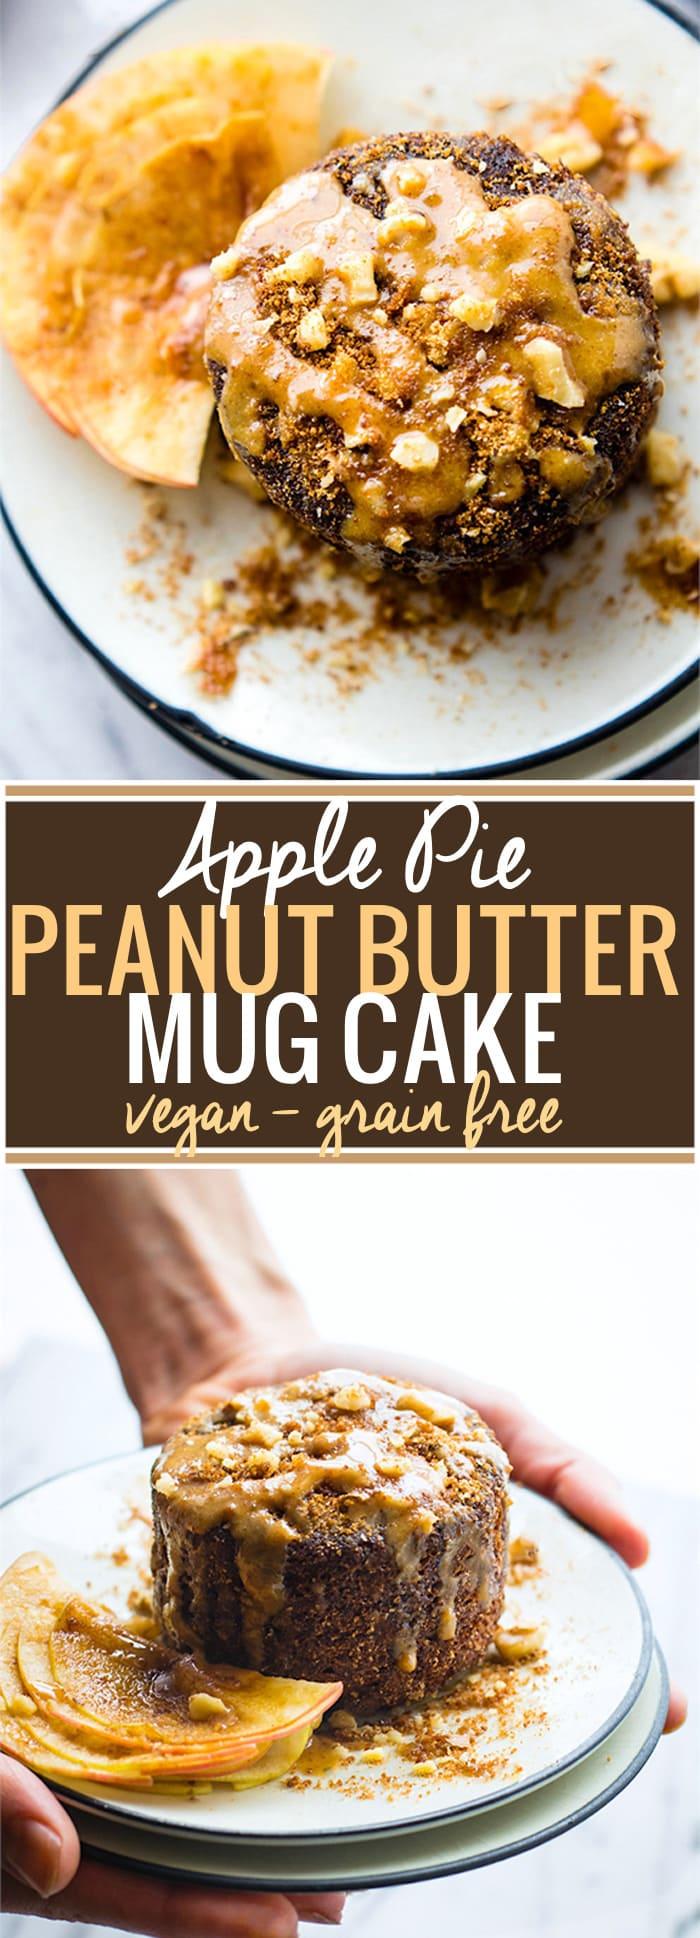 Apple Pie Peanut Butter Mug Cake Vegan Grain Free